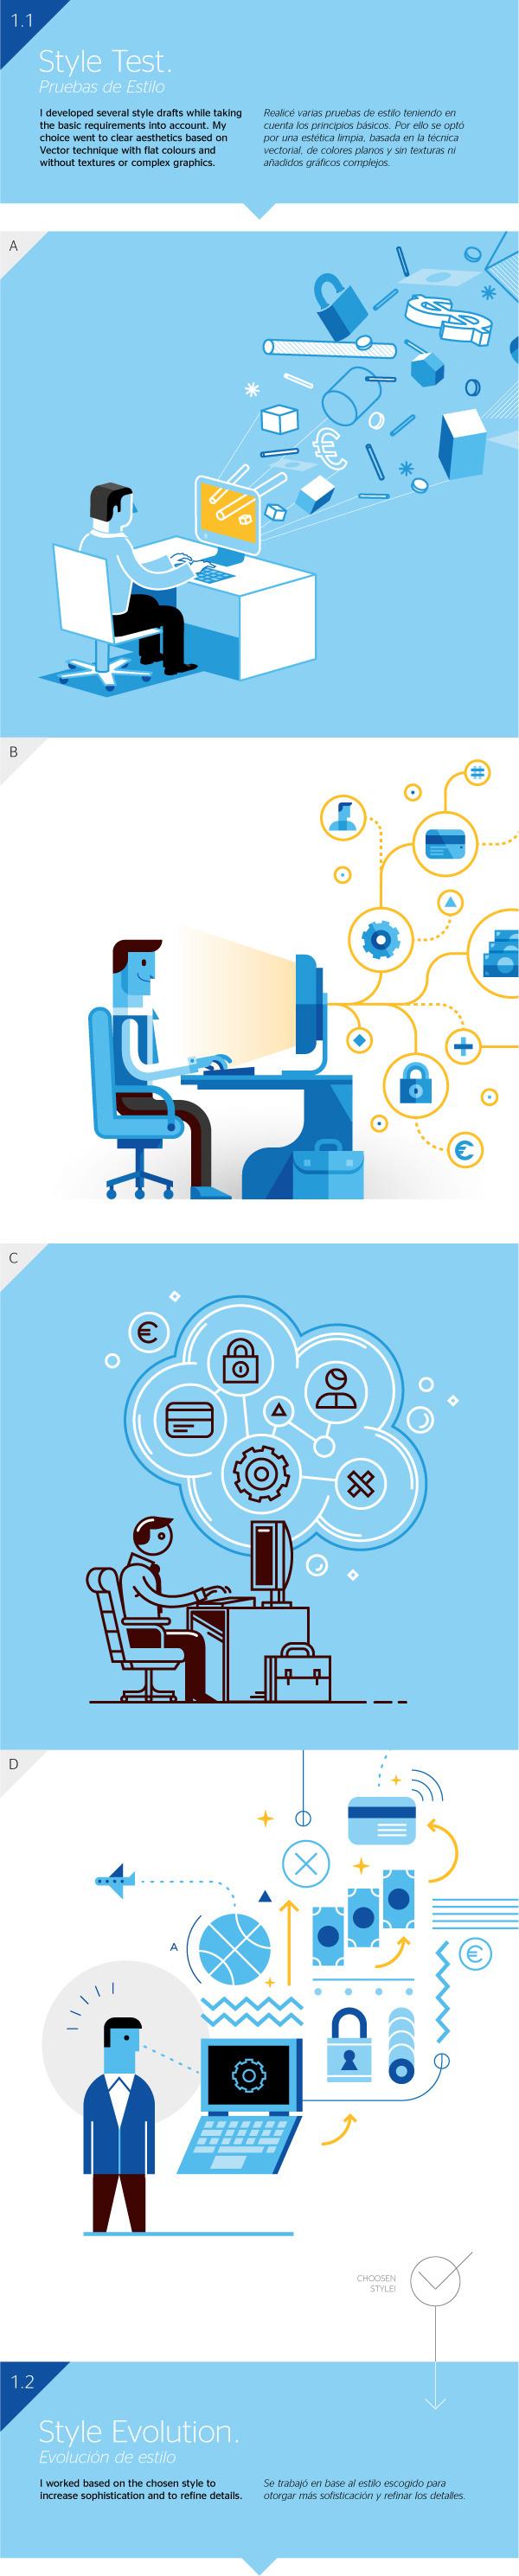 BBVA Corporative Illustration #computer #vector #mauco #business #commerce #sosa #corporative #corporate #illustration #logistics #blue #bbva